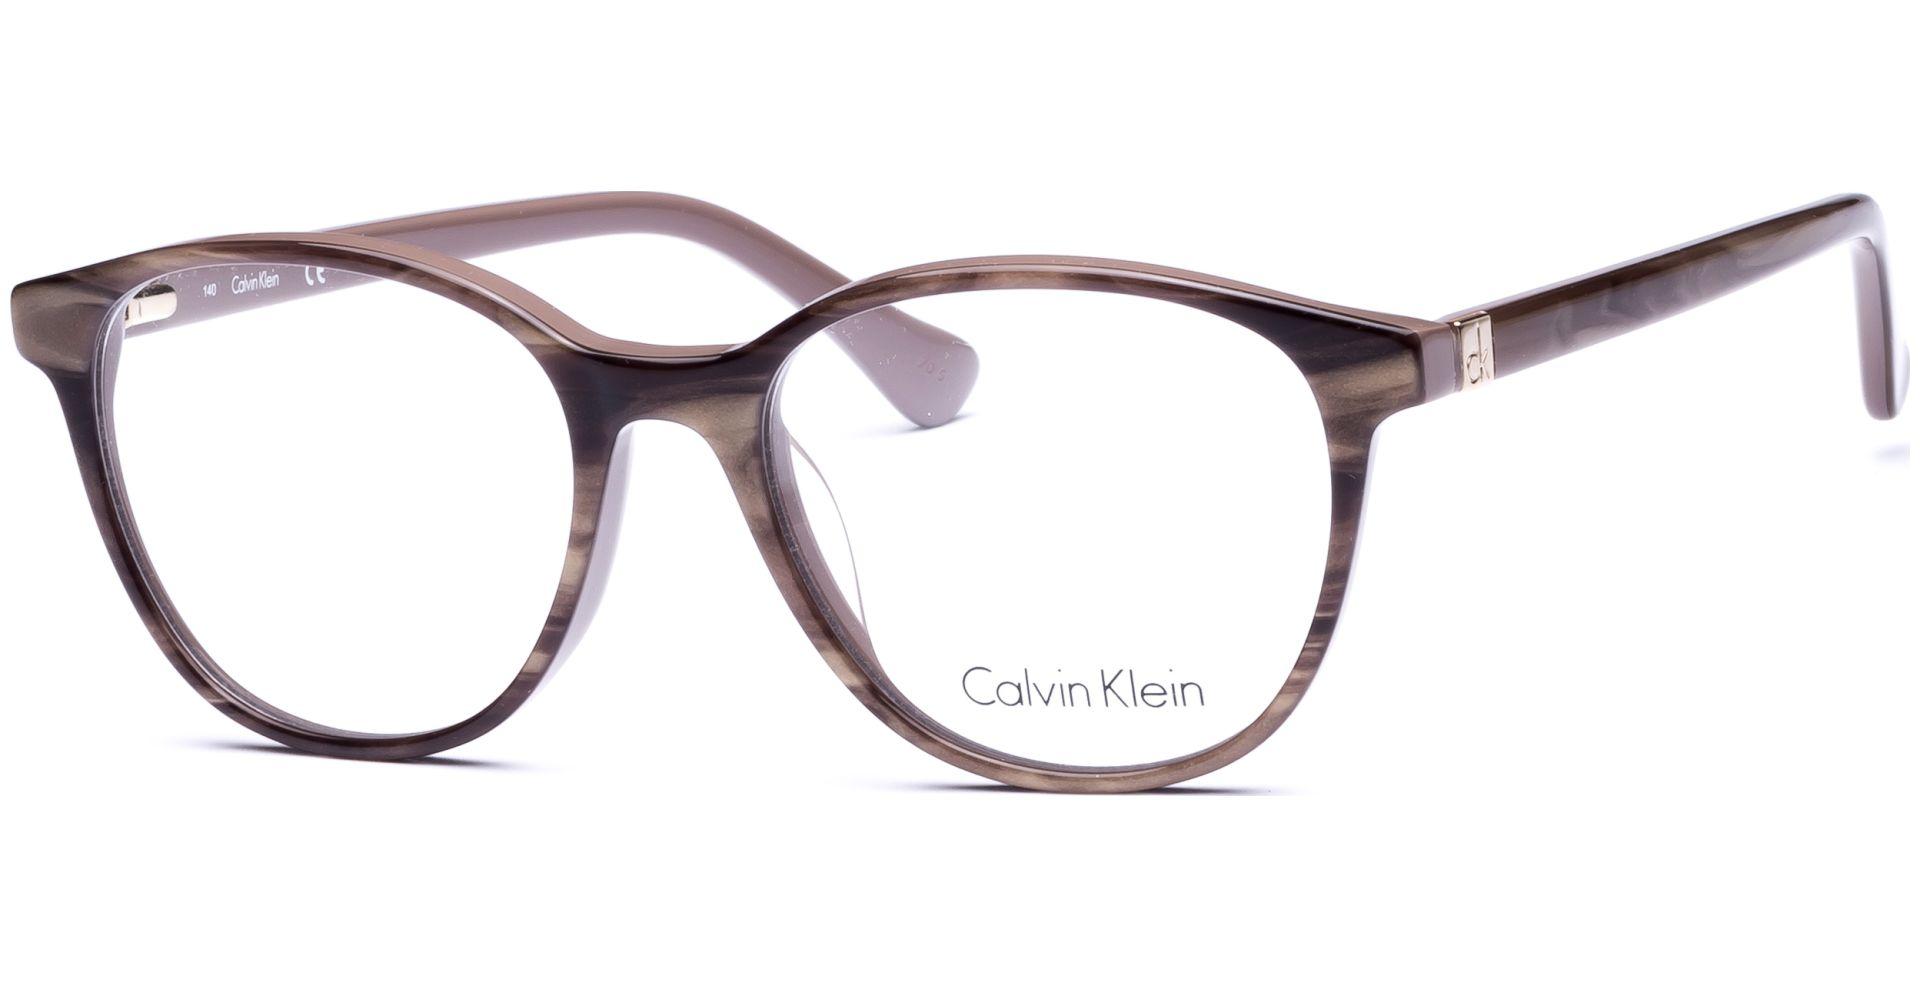 ck Calvin Klein - CK Platinum ck5884 240 5217 STRIPED LIGHT BROWN ...